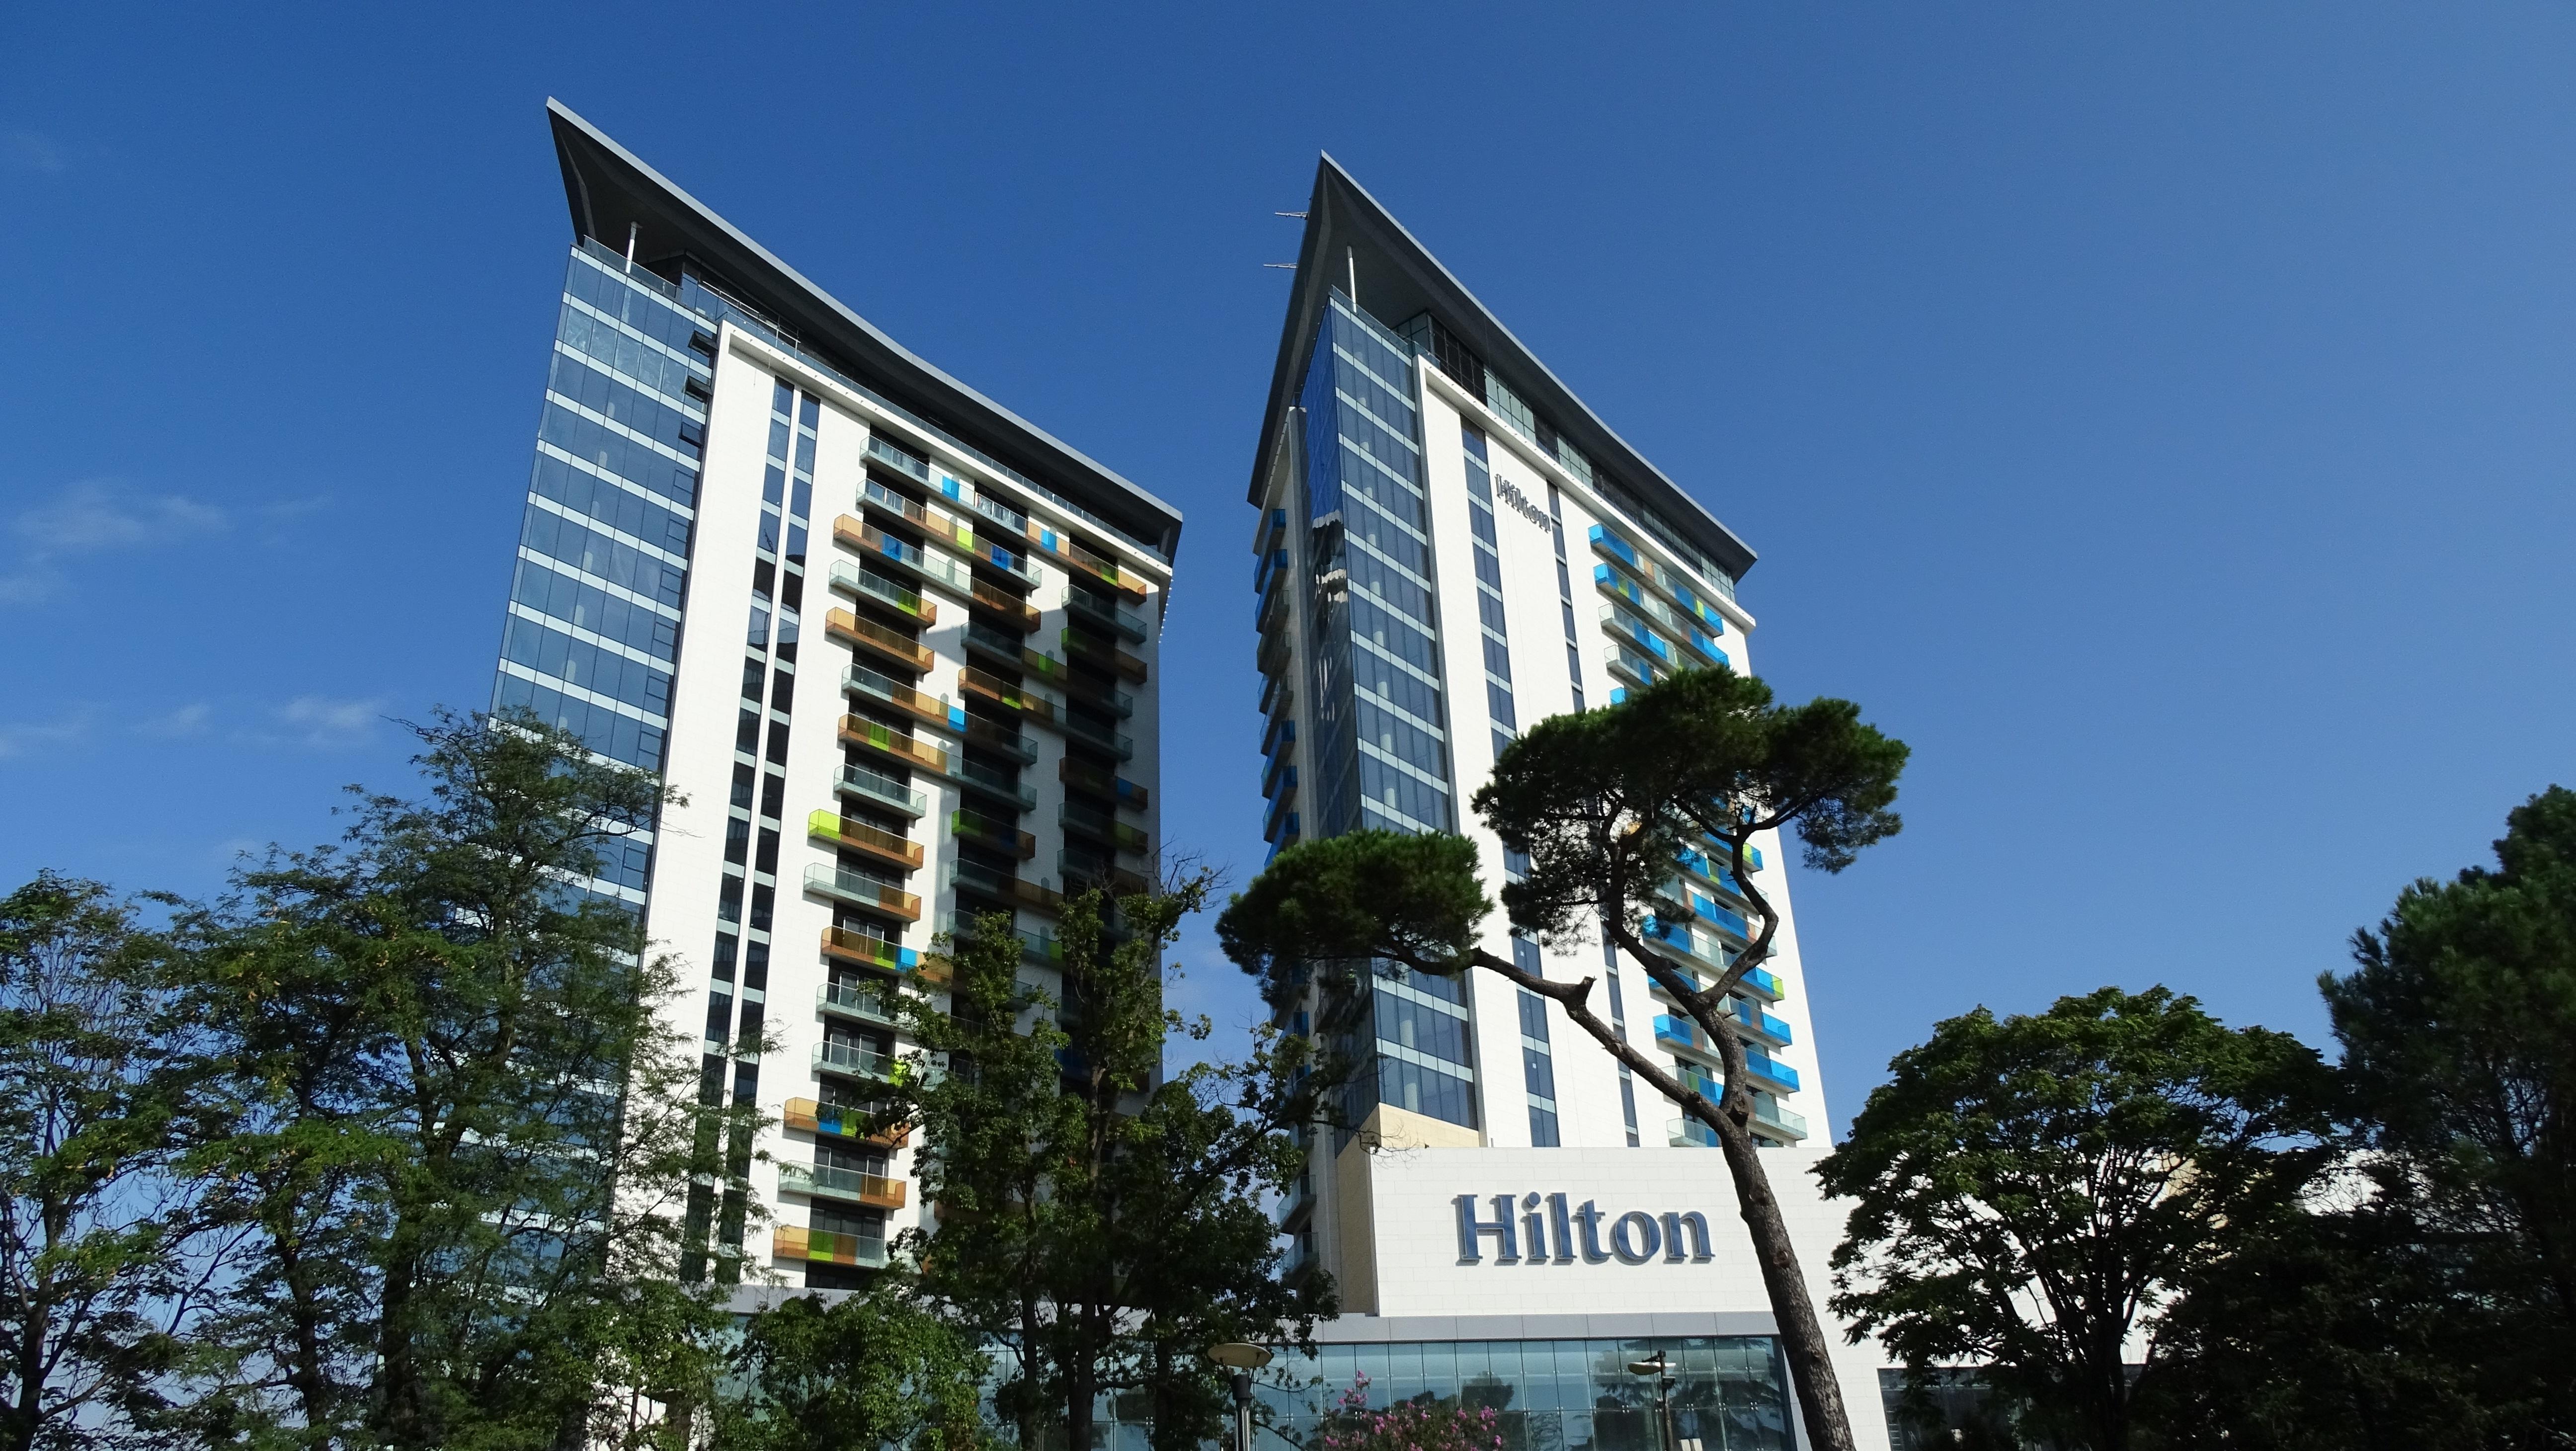 Hilton Honors Buy Points 100% Bonus Promotion